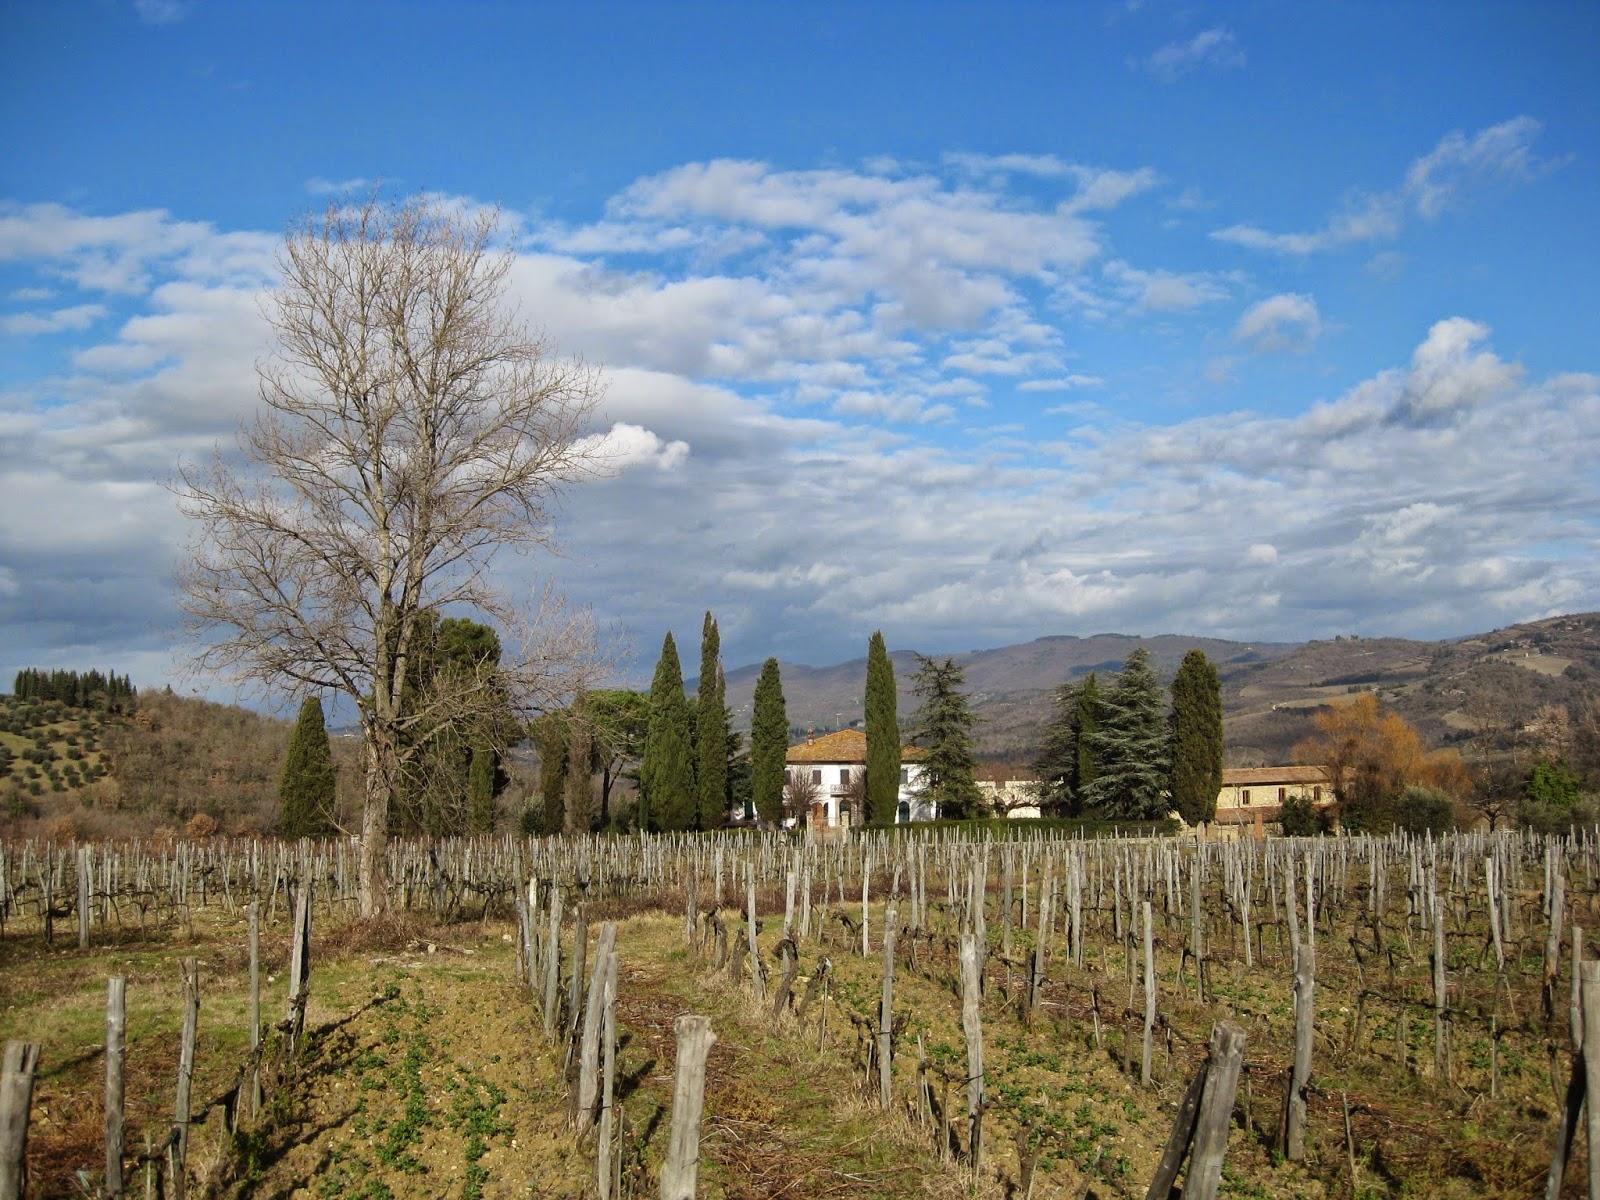 Viñedo en un caracteristico paisaje Toscano